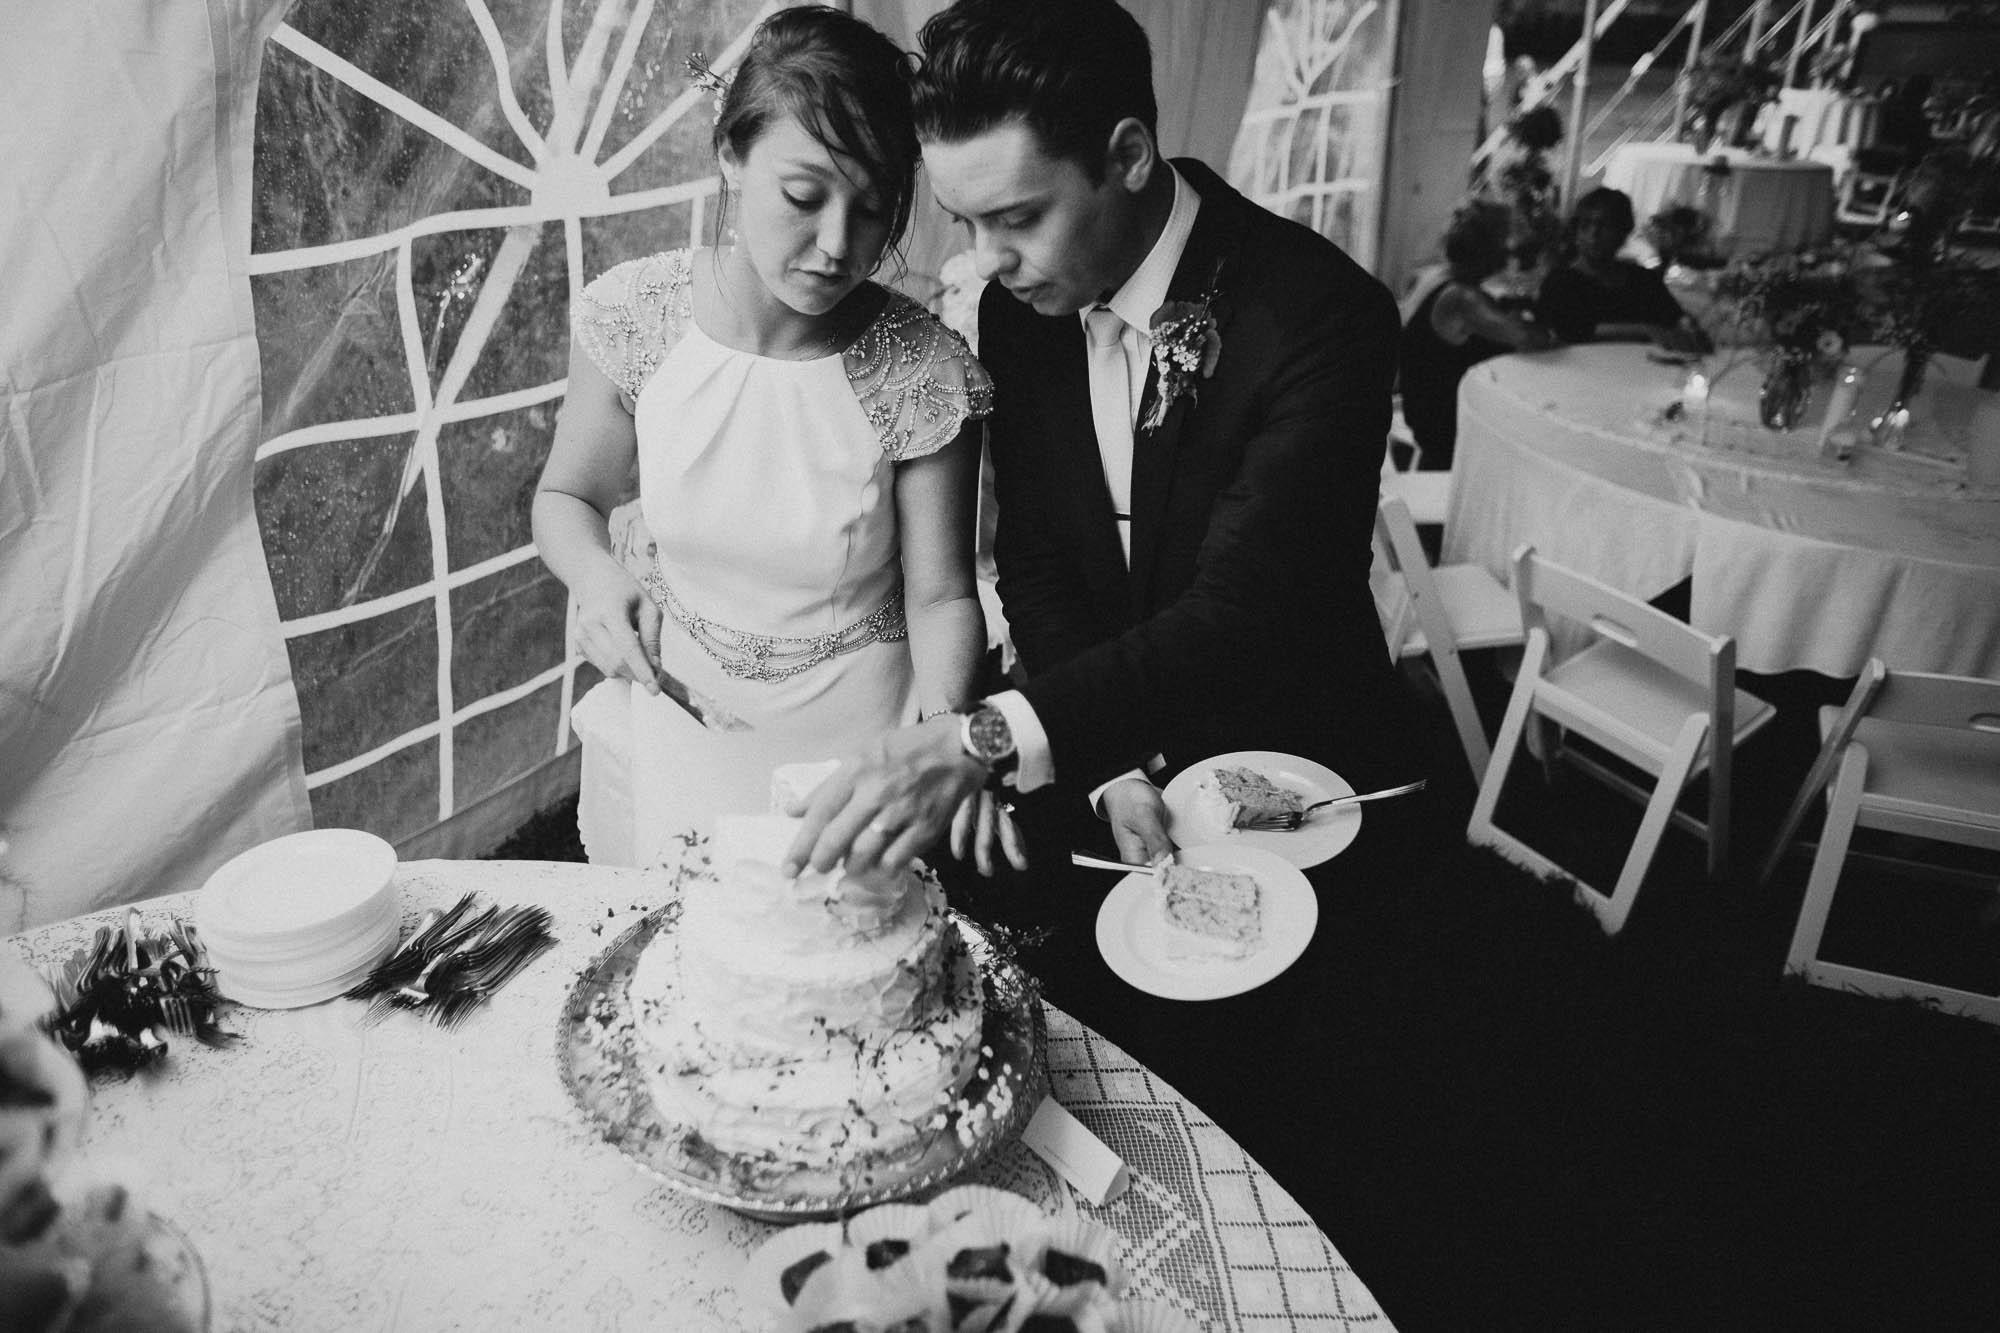 Leah-Graham-Michigan-Outdoor-DIY-Wedding-066@2x.jpg